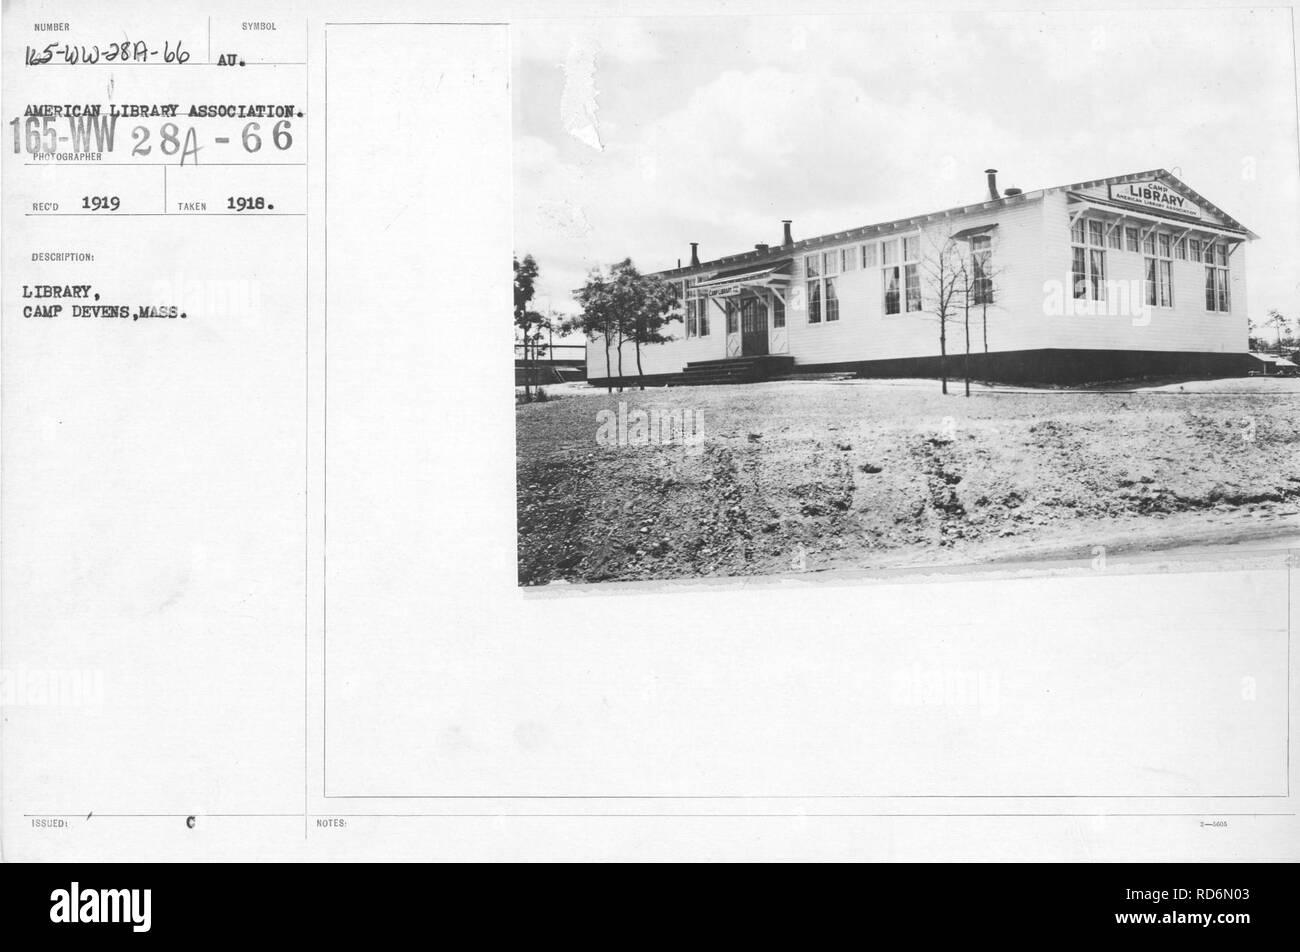 Ely Nv Clan Library Nevada Wwwtollebildcom